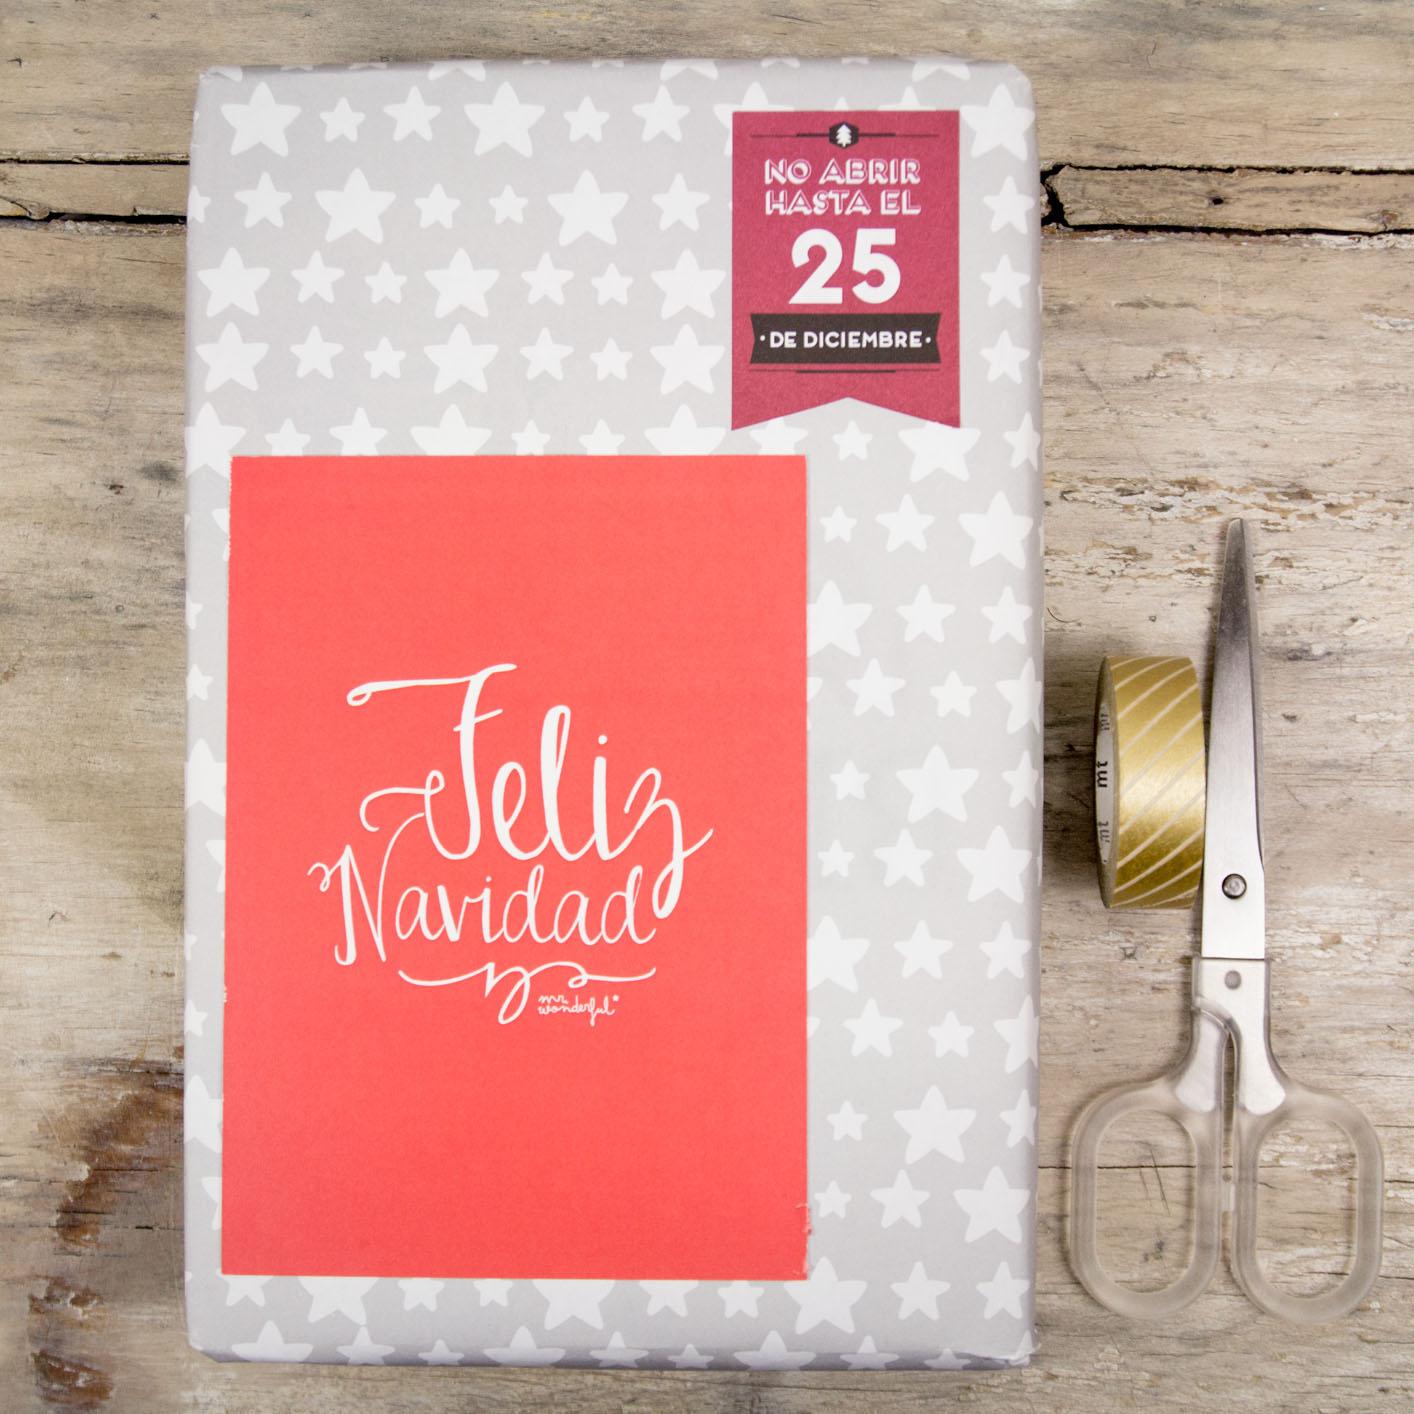 Mr_wonderful_tutorial_descargable_freebie_tarjeta_regalo_navidad_020